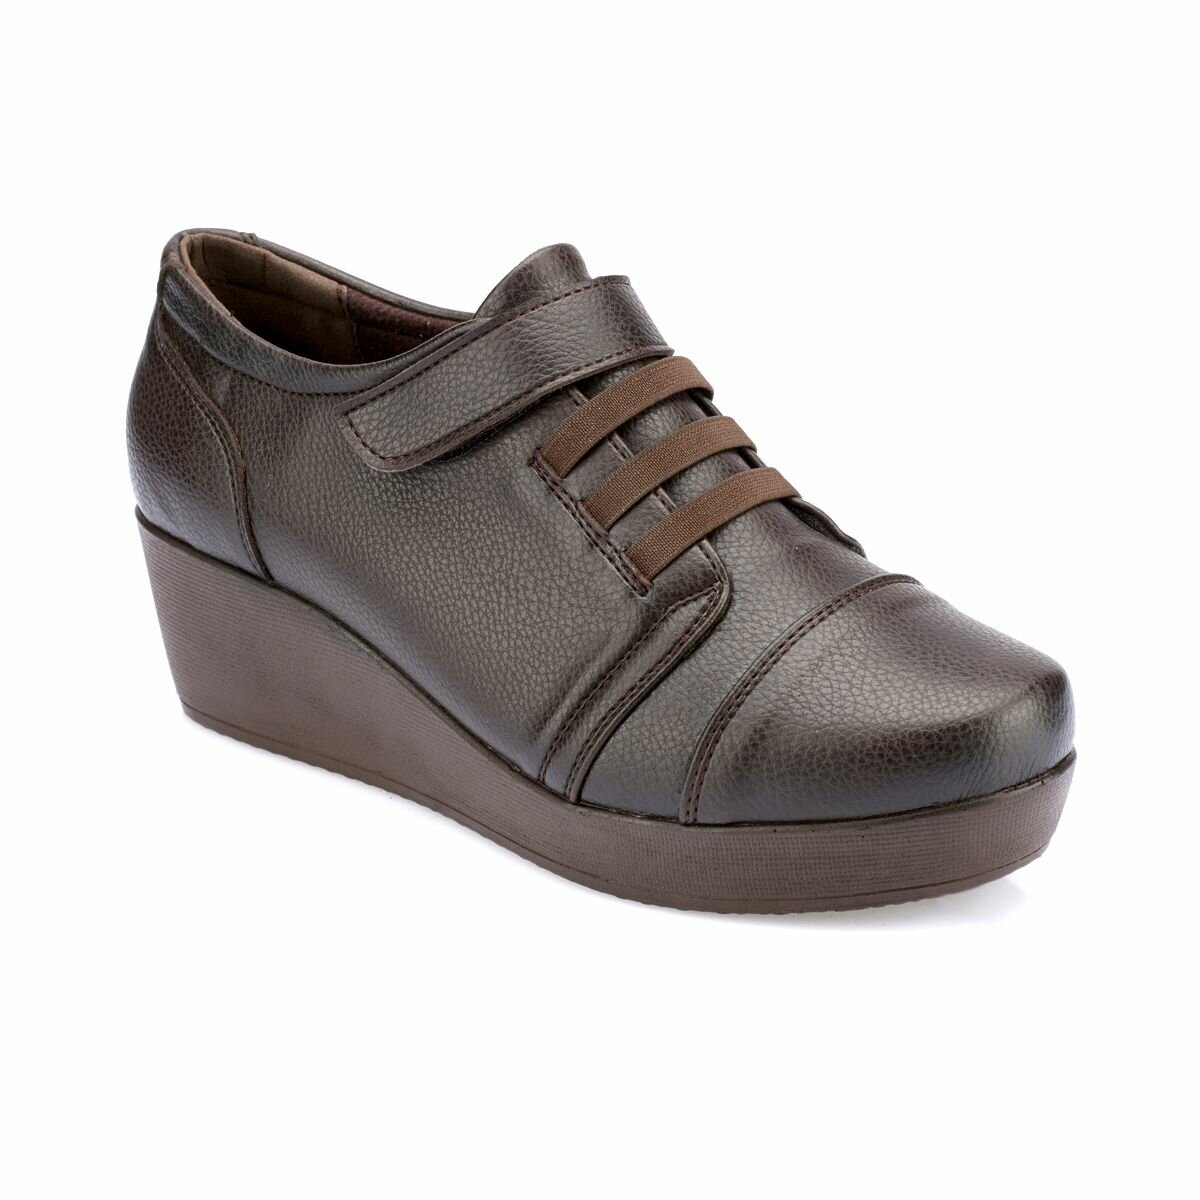 FLO 82.109121.Z Brown Women 'S Shoes Polaris 5 Point